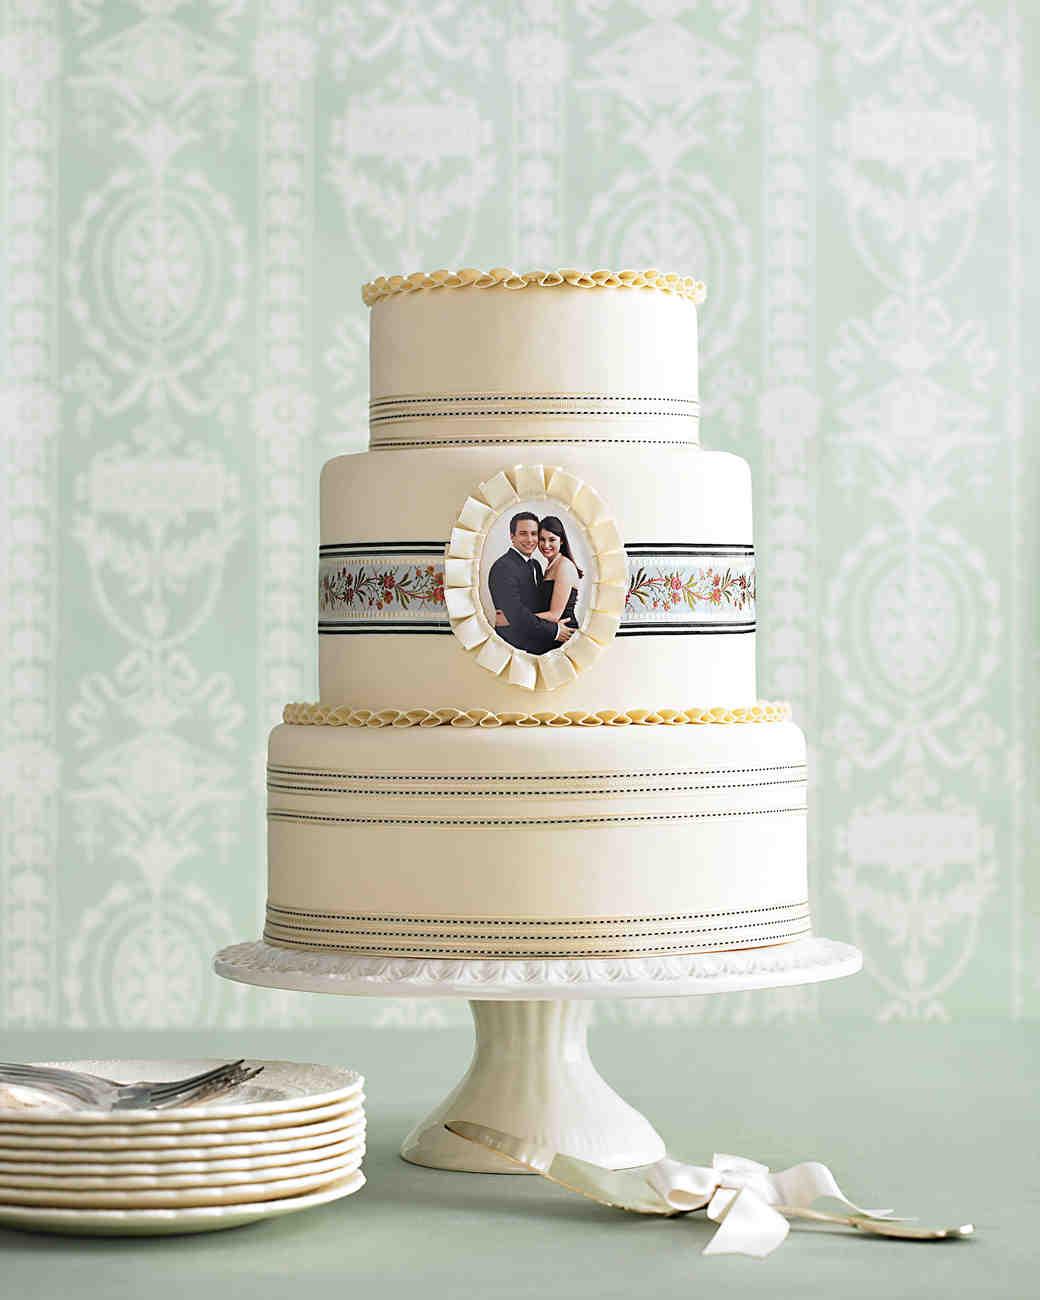 bow-cakes-mwd104142-photo-0515.jpg